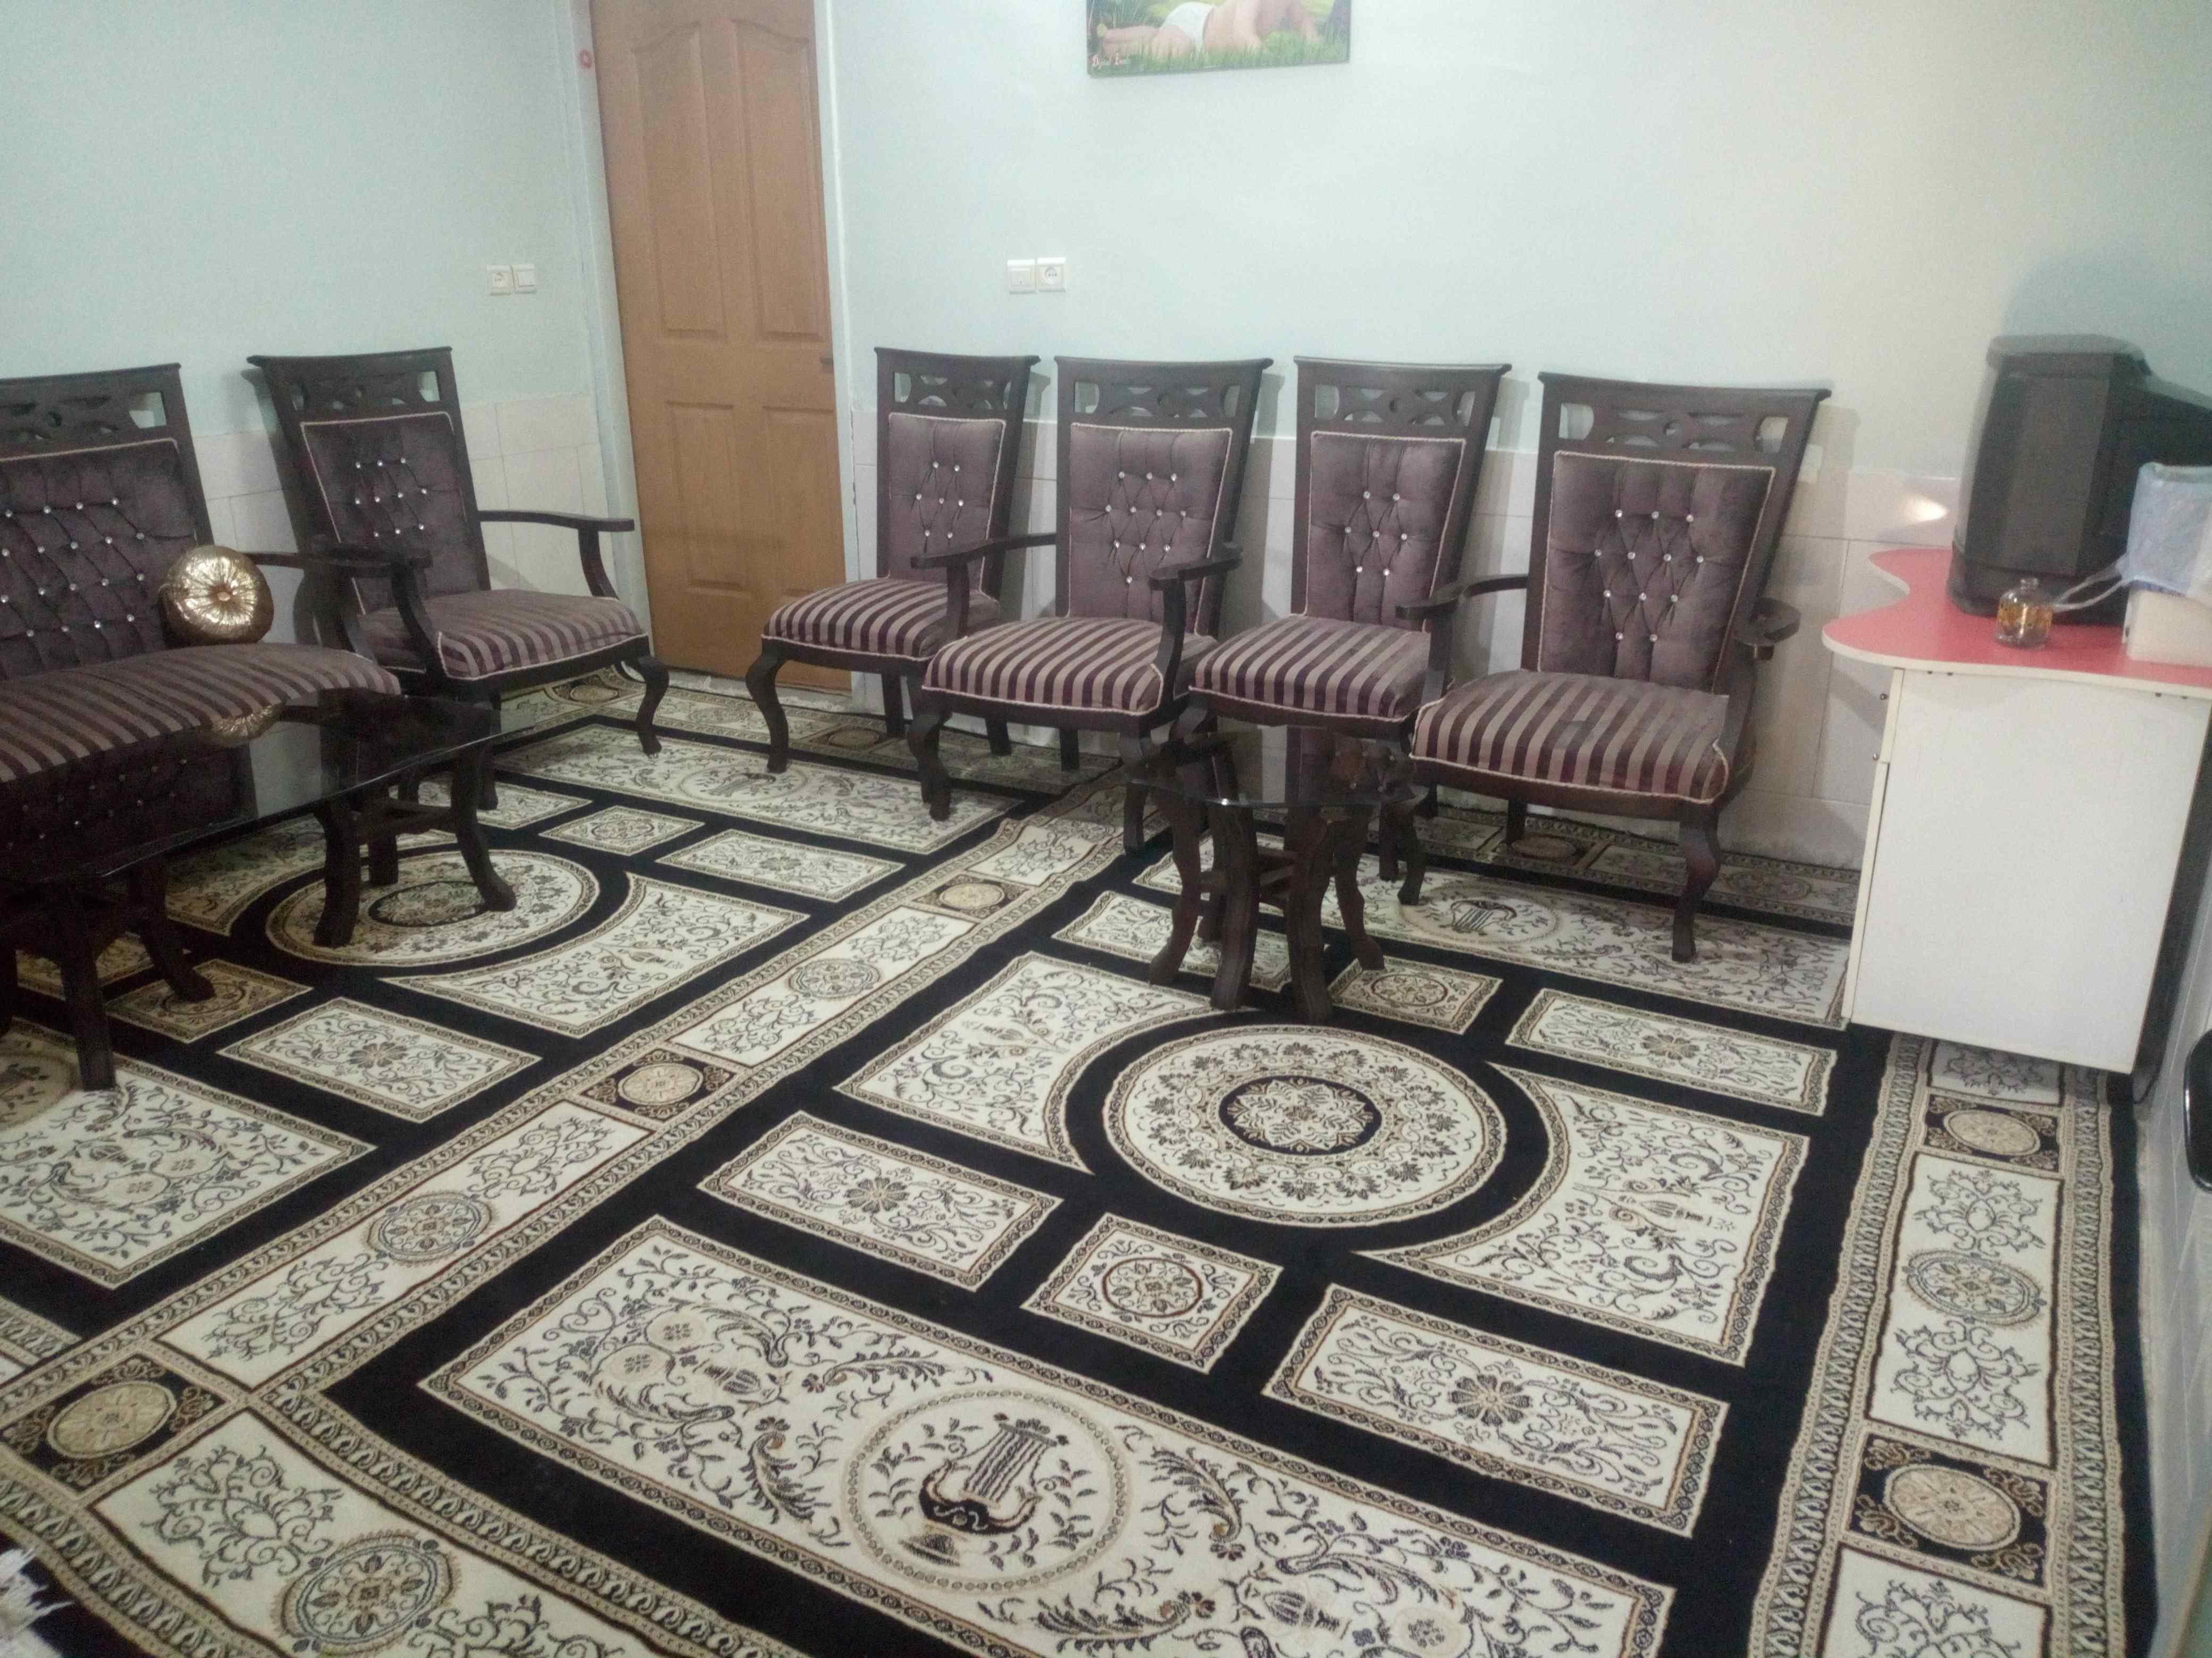 townee خانه مبله در پروین اصفهان